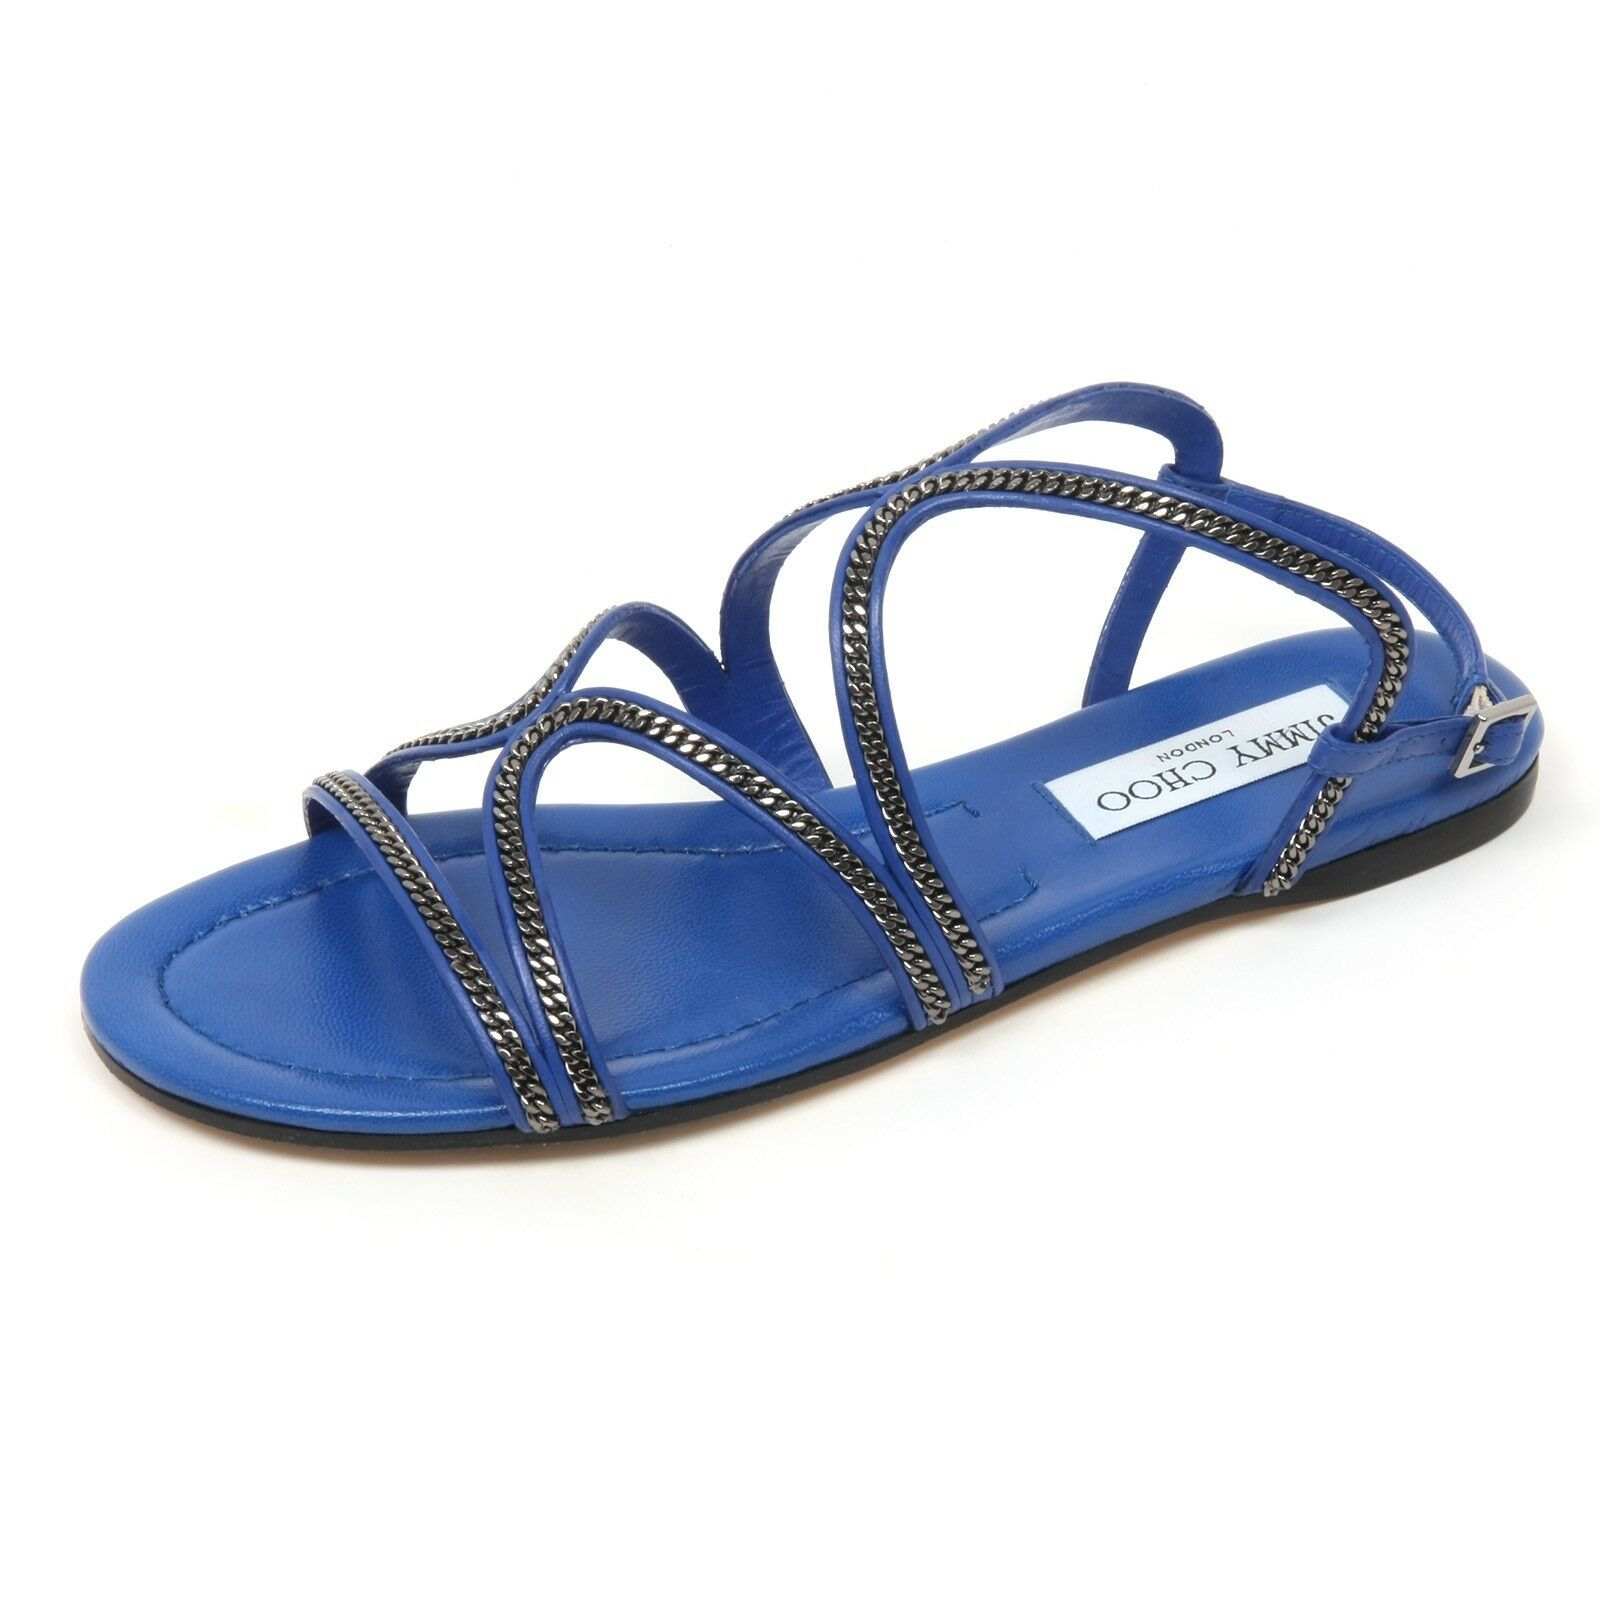 C8942 Sandal donna  Jimmy Choo Nickel Flat scarpe Cobalt blu scarpe Donna  acquista online